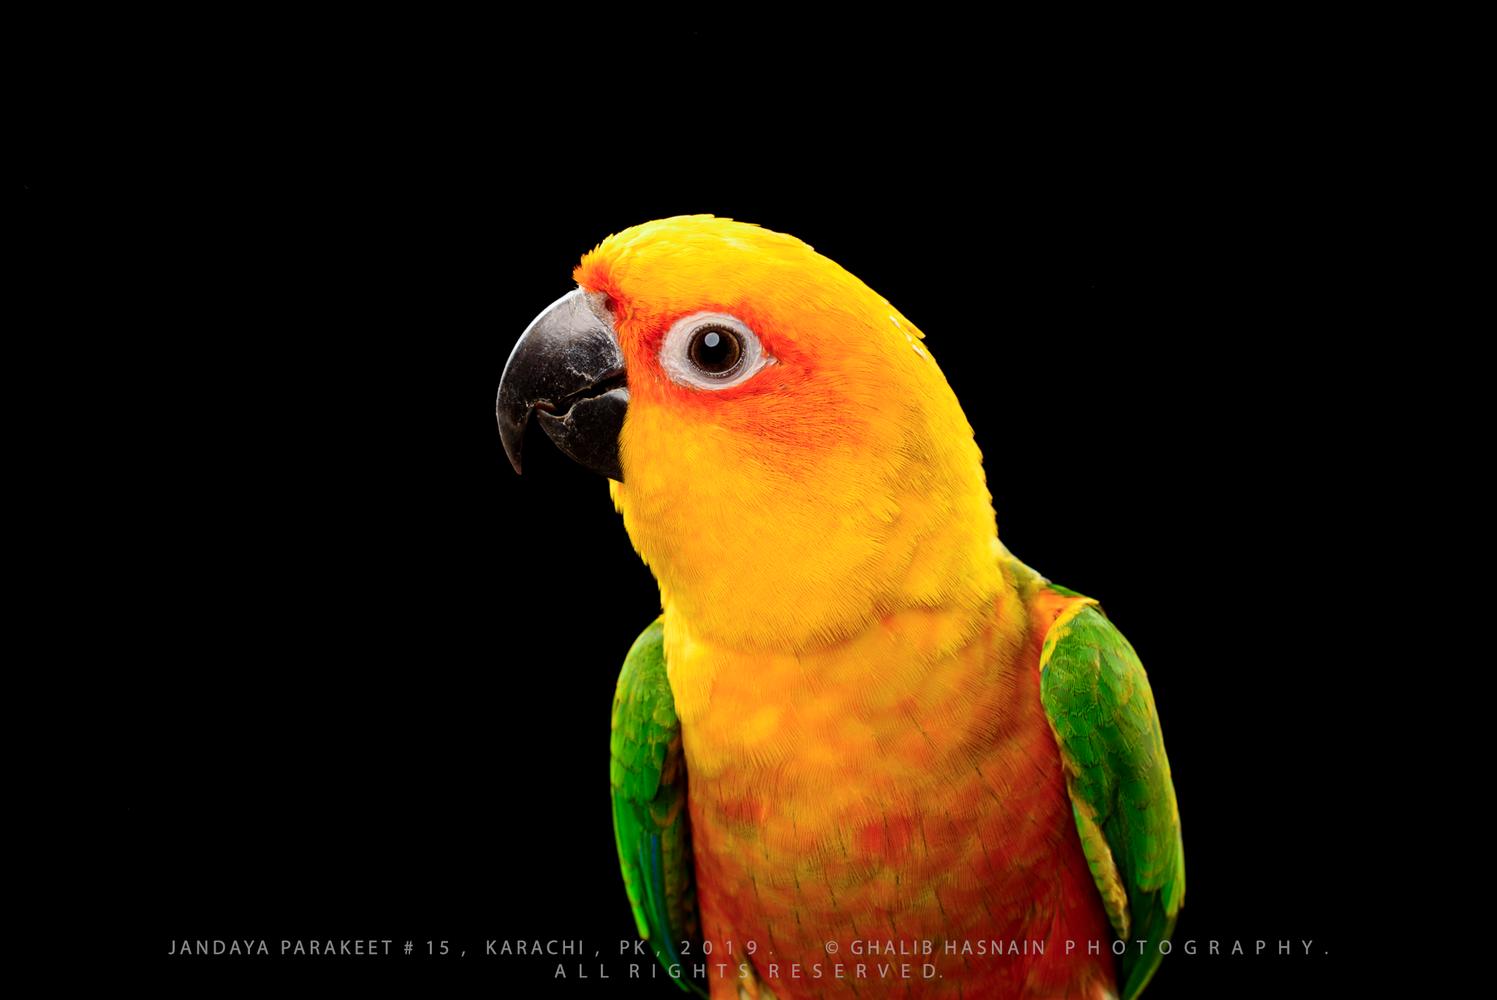 Jandaya Parakeet by Ghalib Hasnain